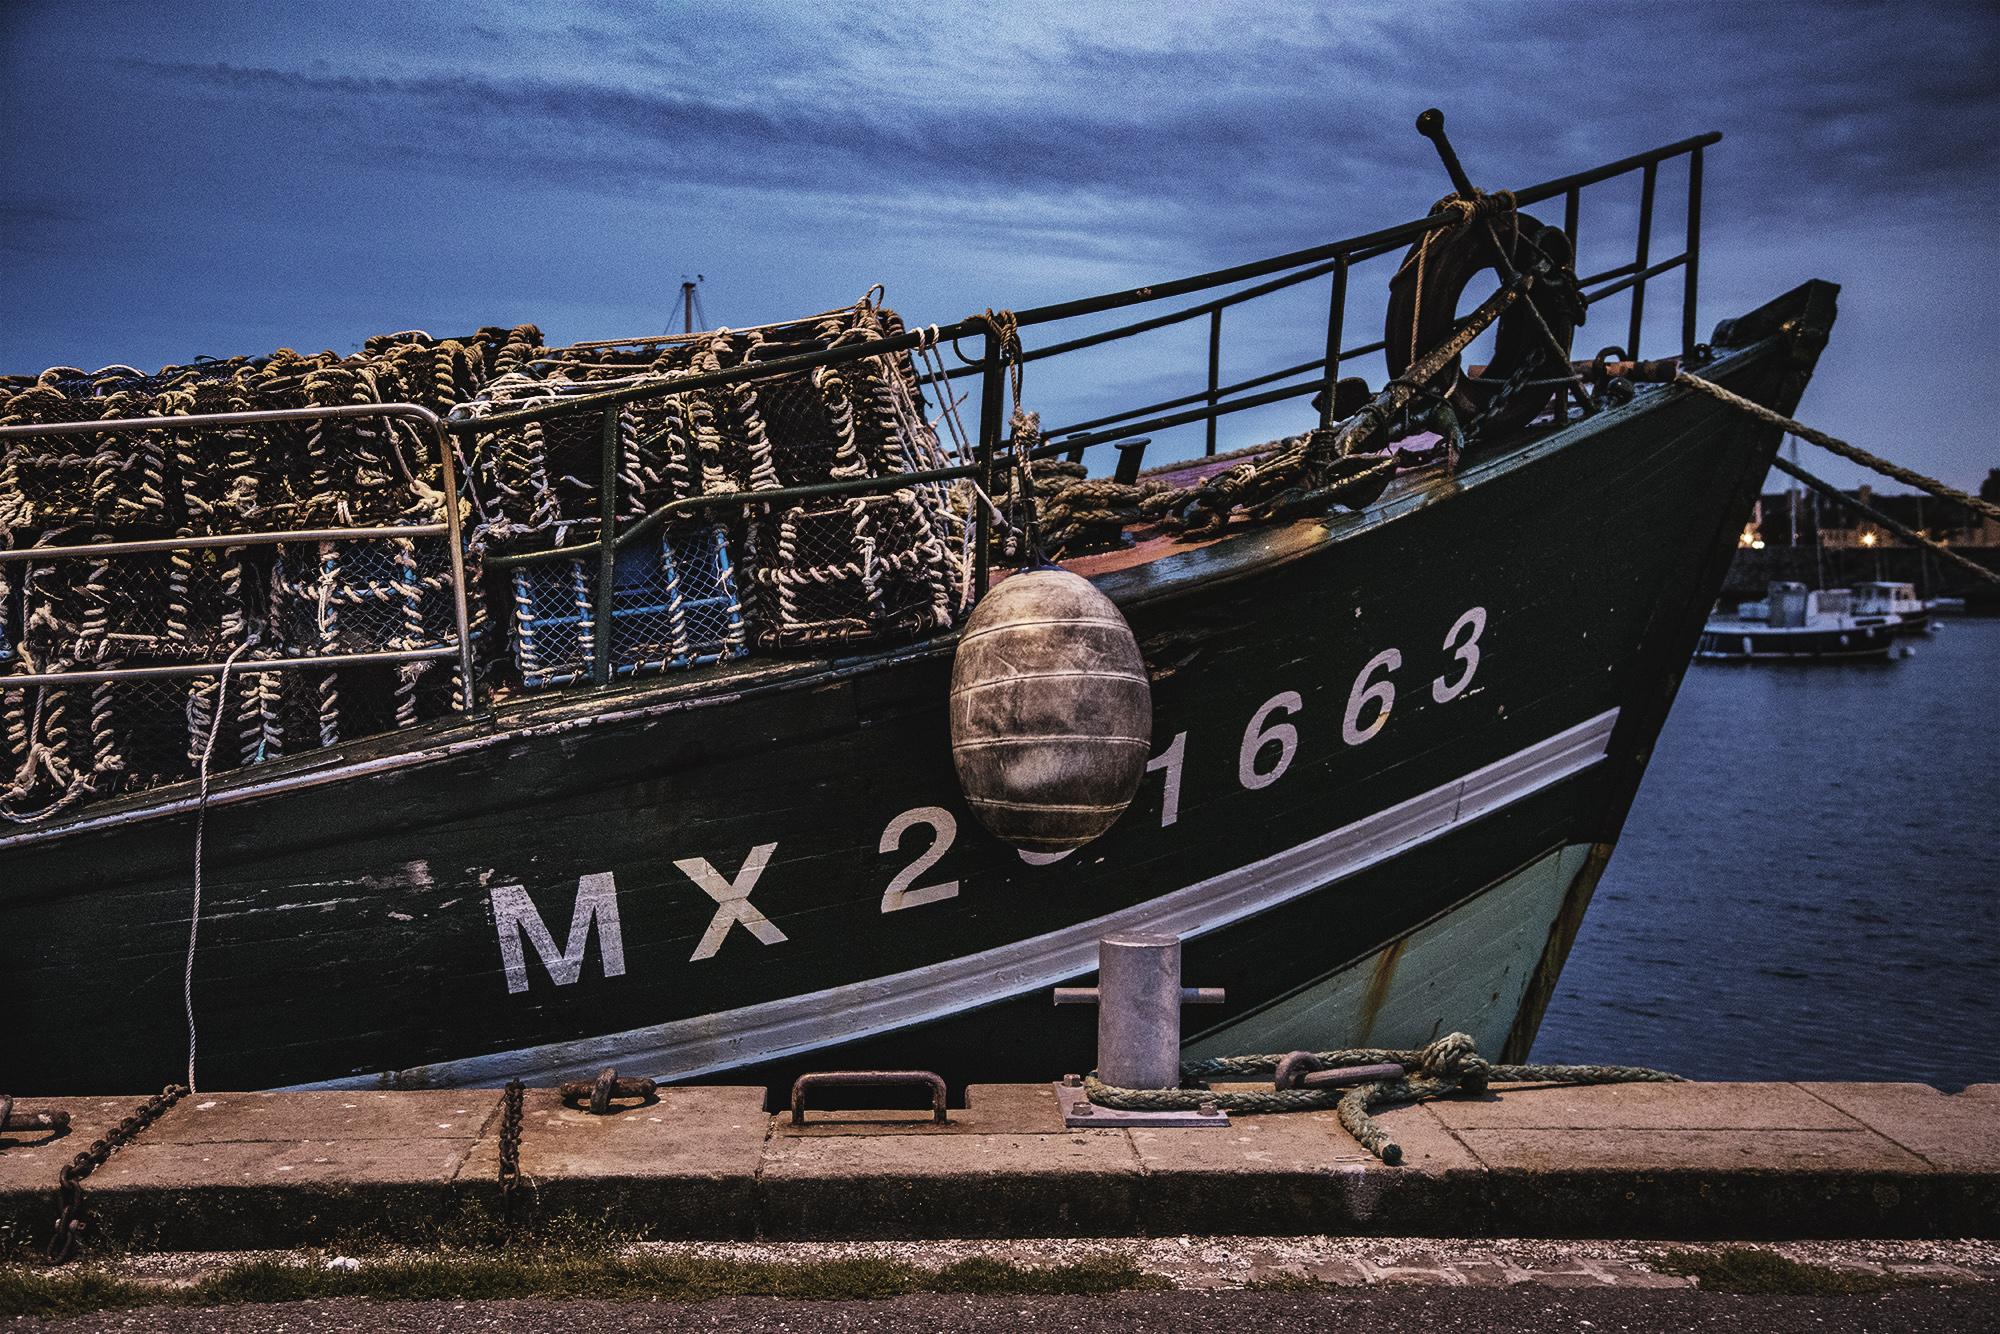 Brittany_Nighttime_Fishing_Boats-070.jpg